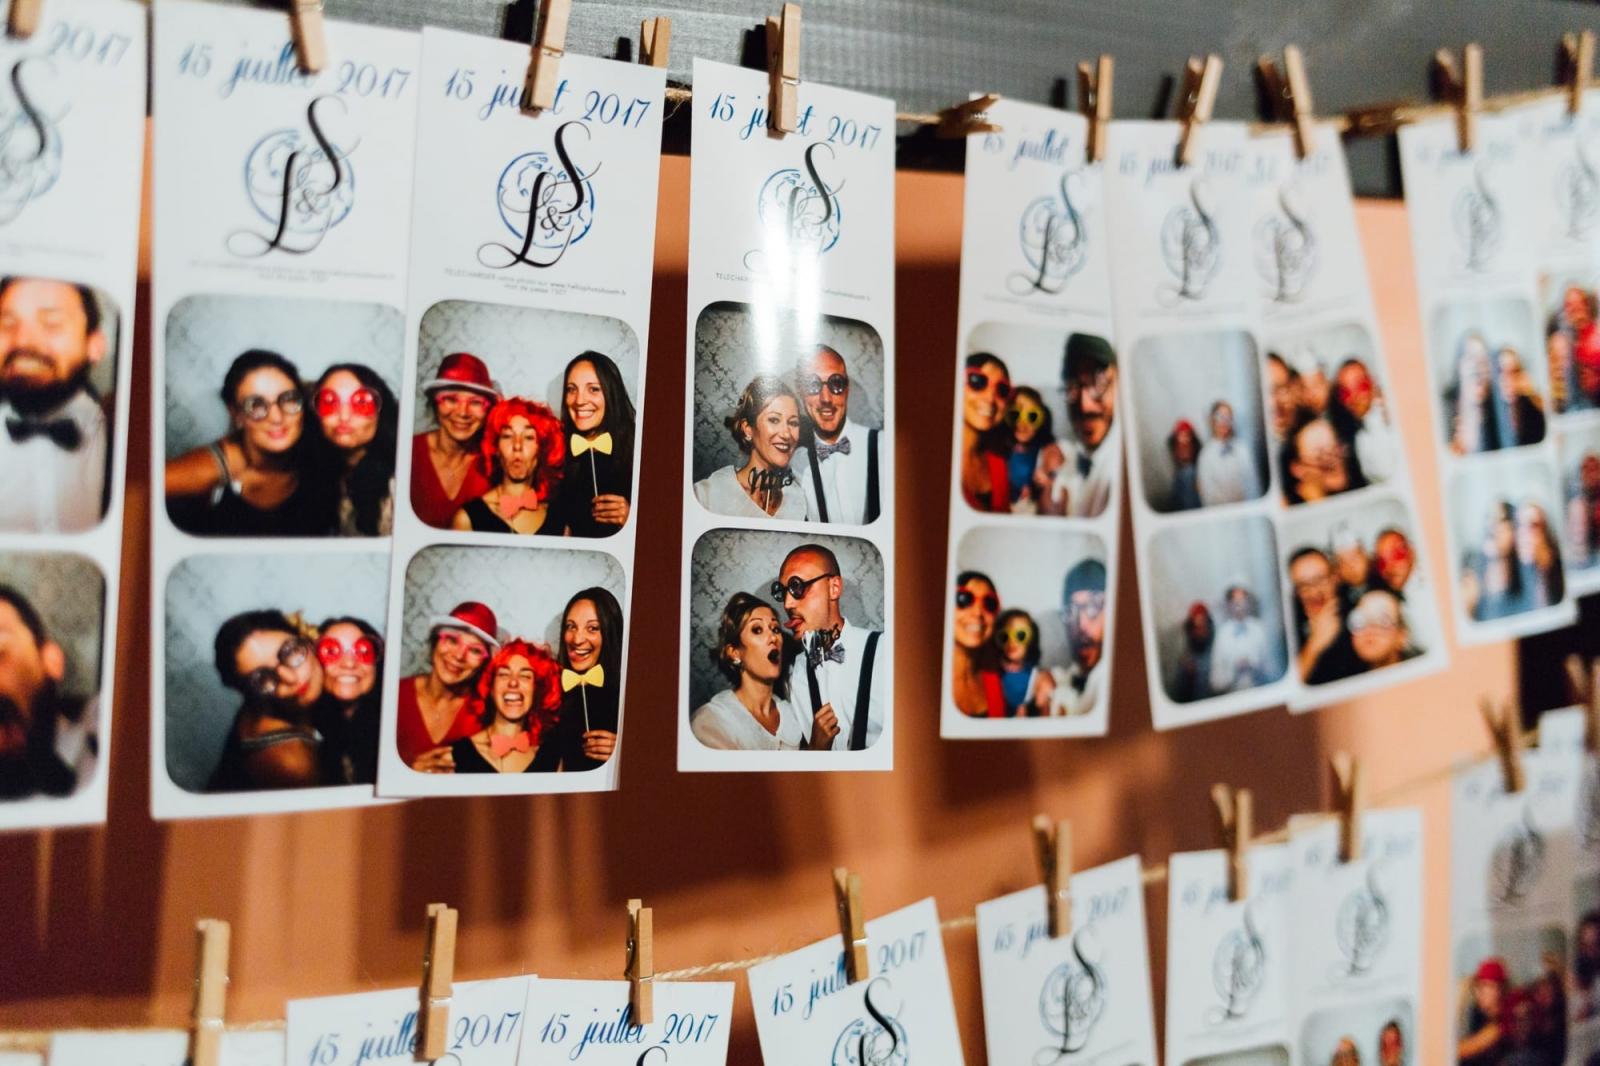 photobooth-mariage-decor-pinces